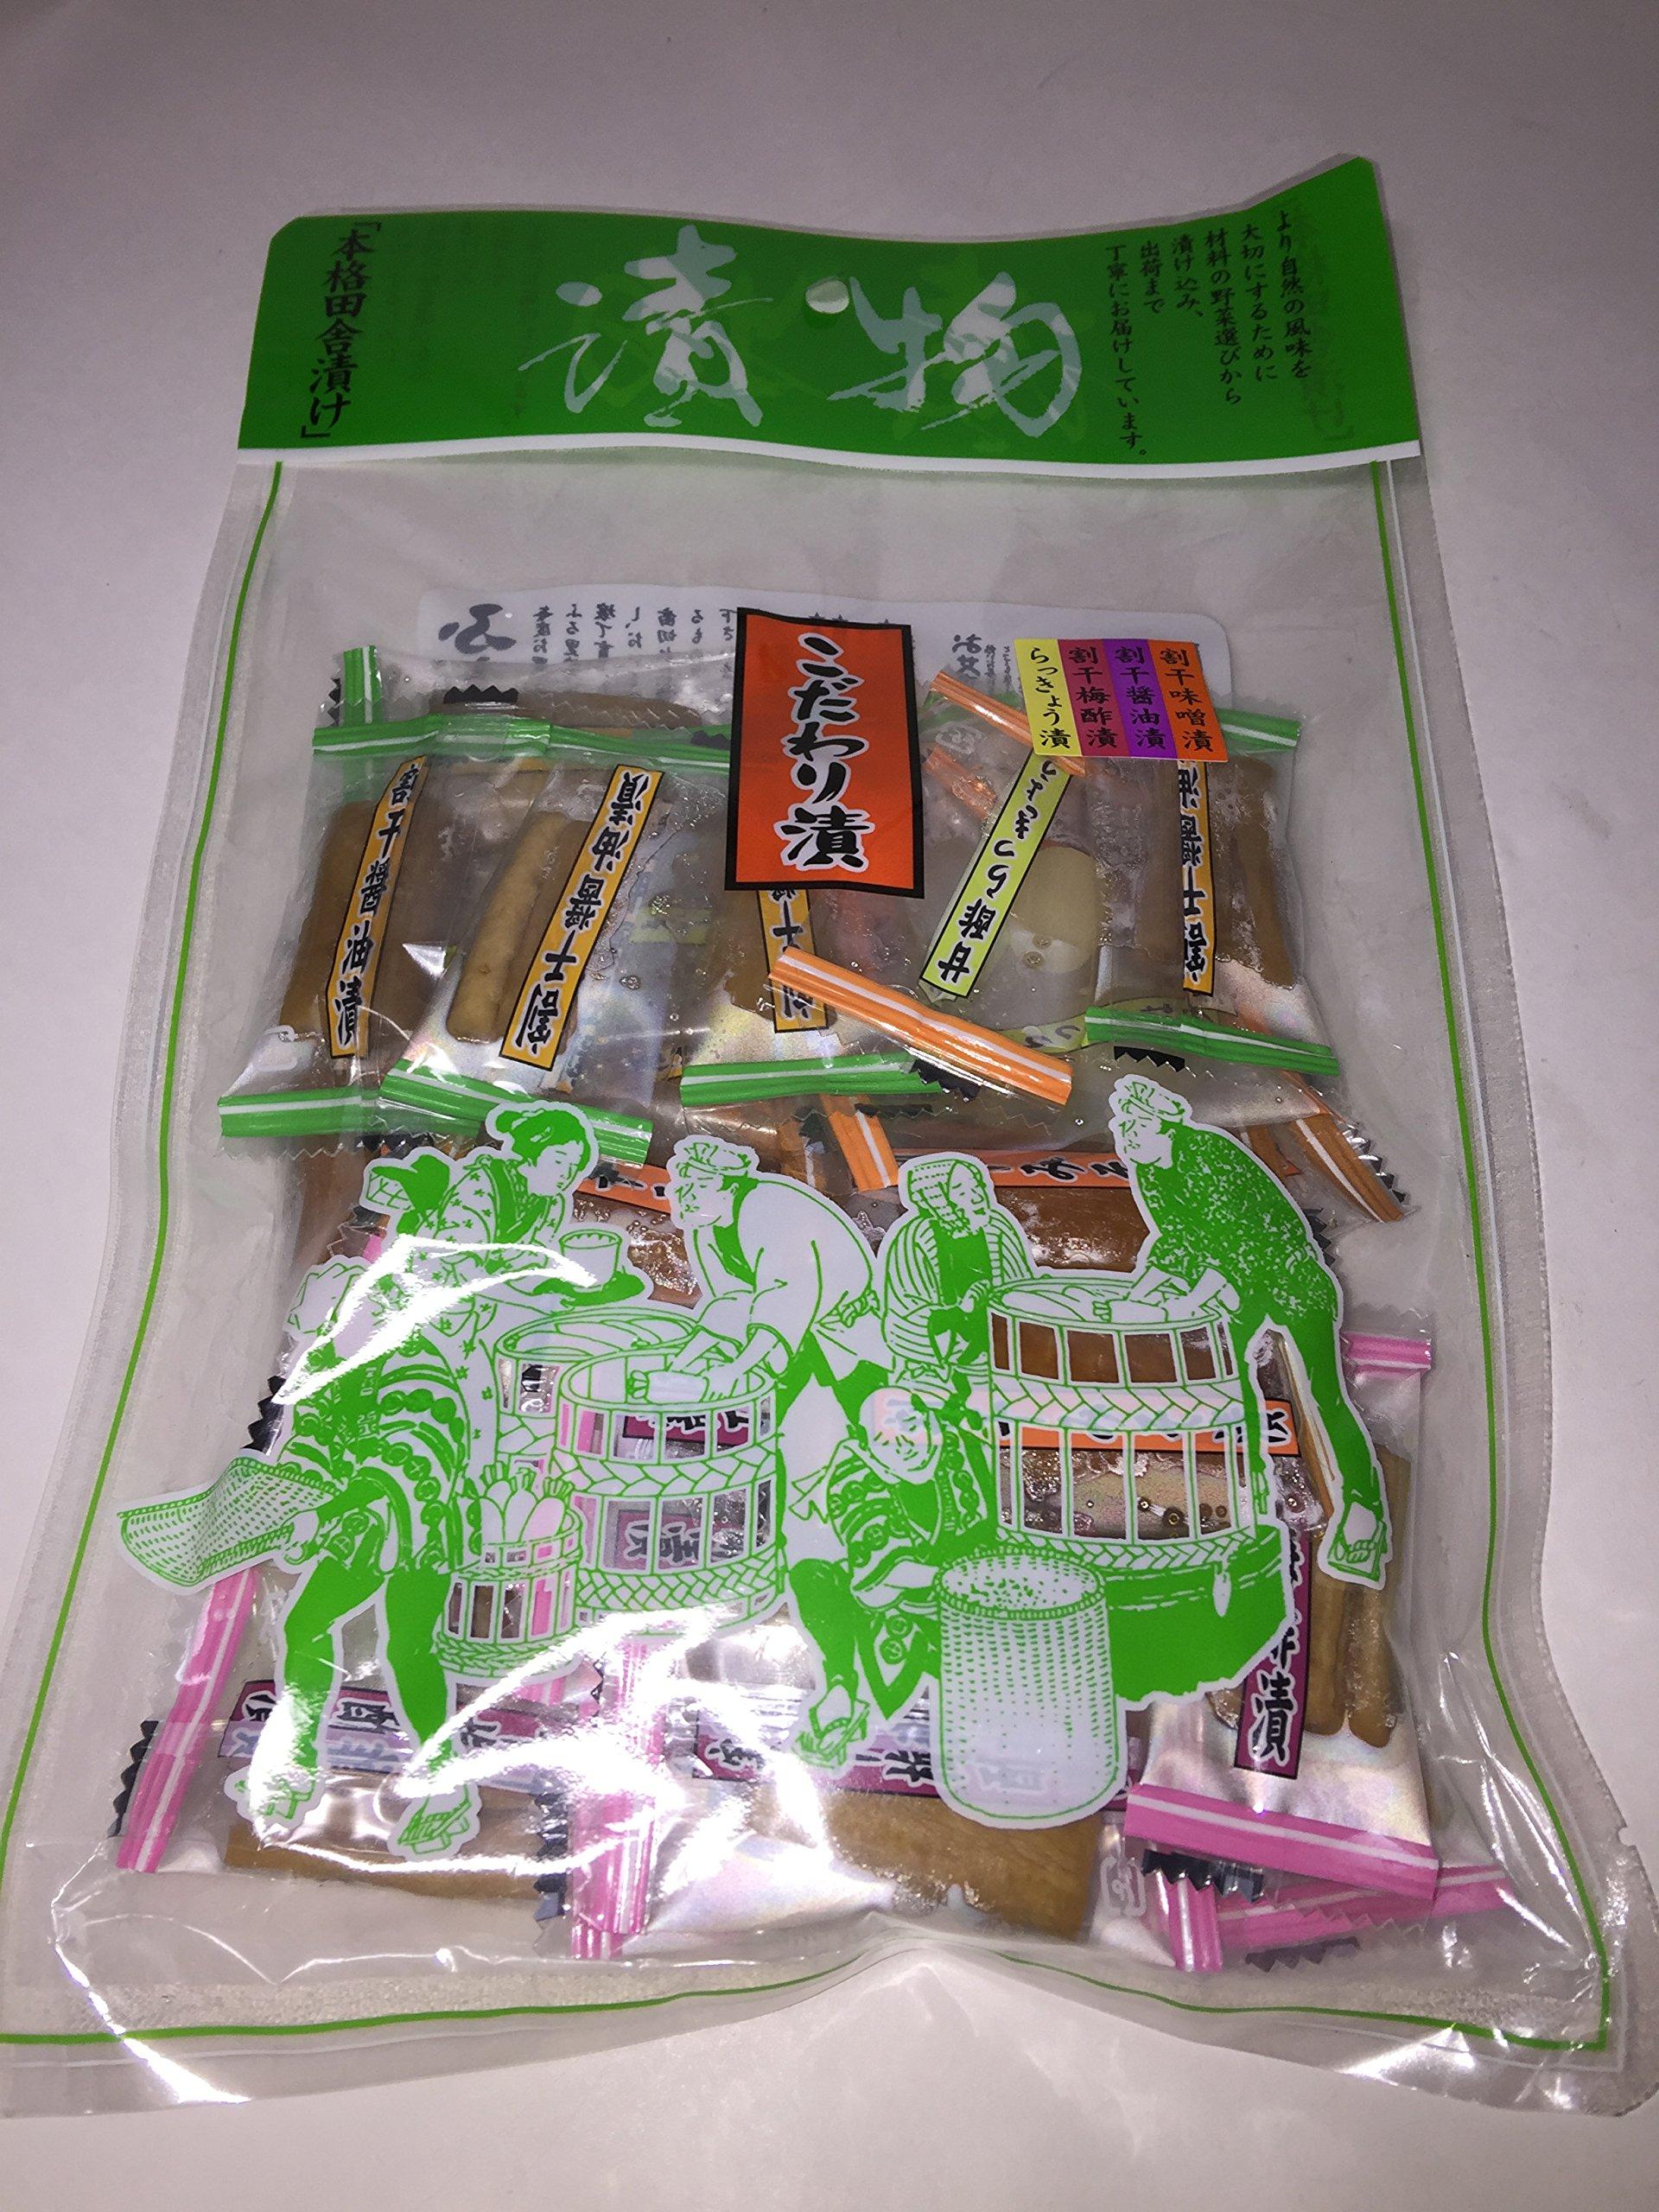 Otsumami 3 pack set Smoked squid, baked sardine, pickles by KINJOKEN MARUESU MIZUTAMARI (Image #4)